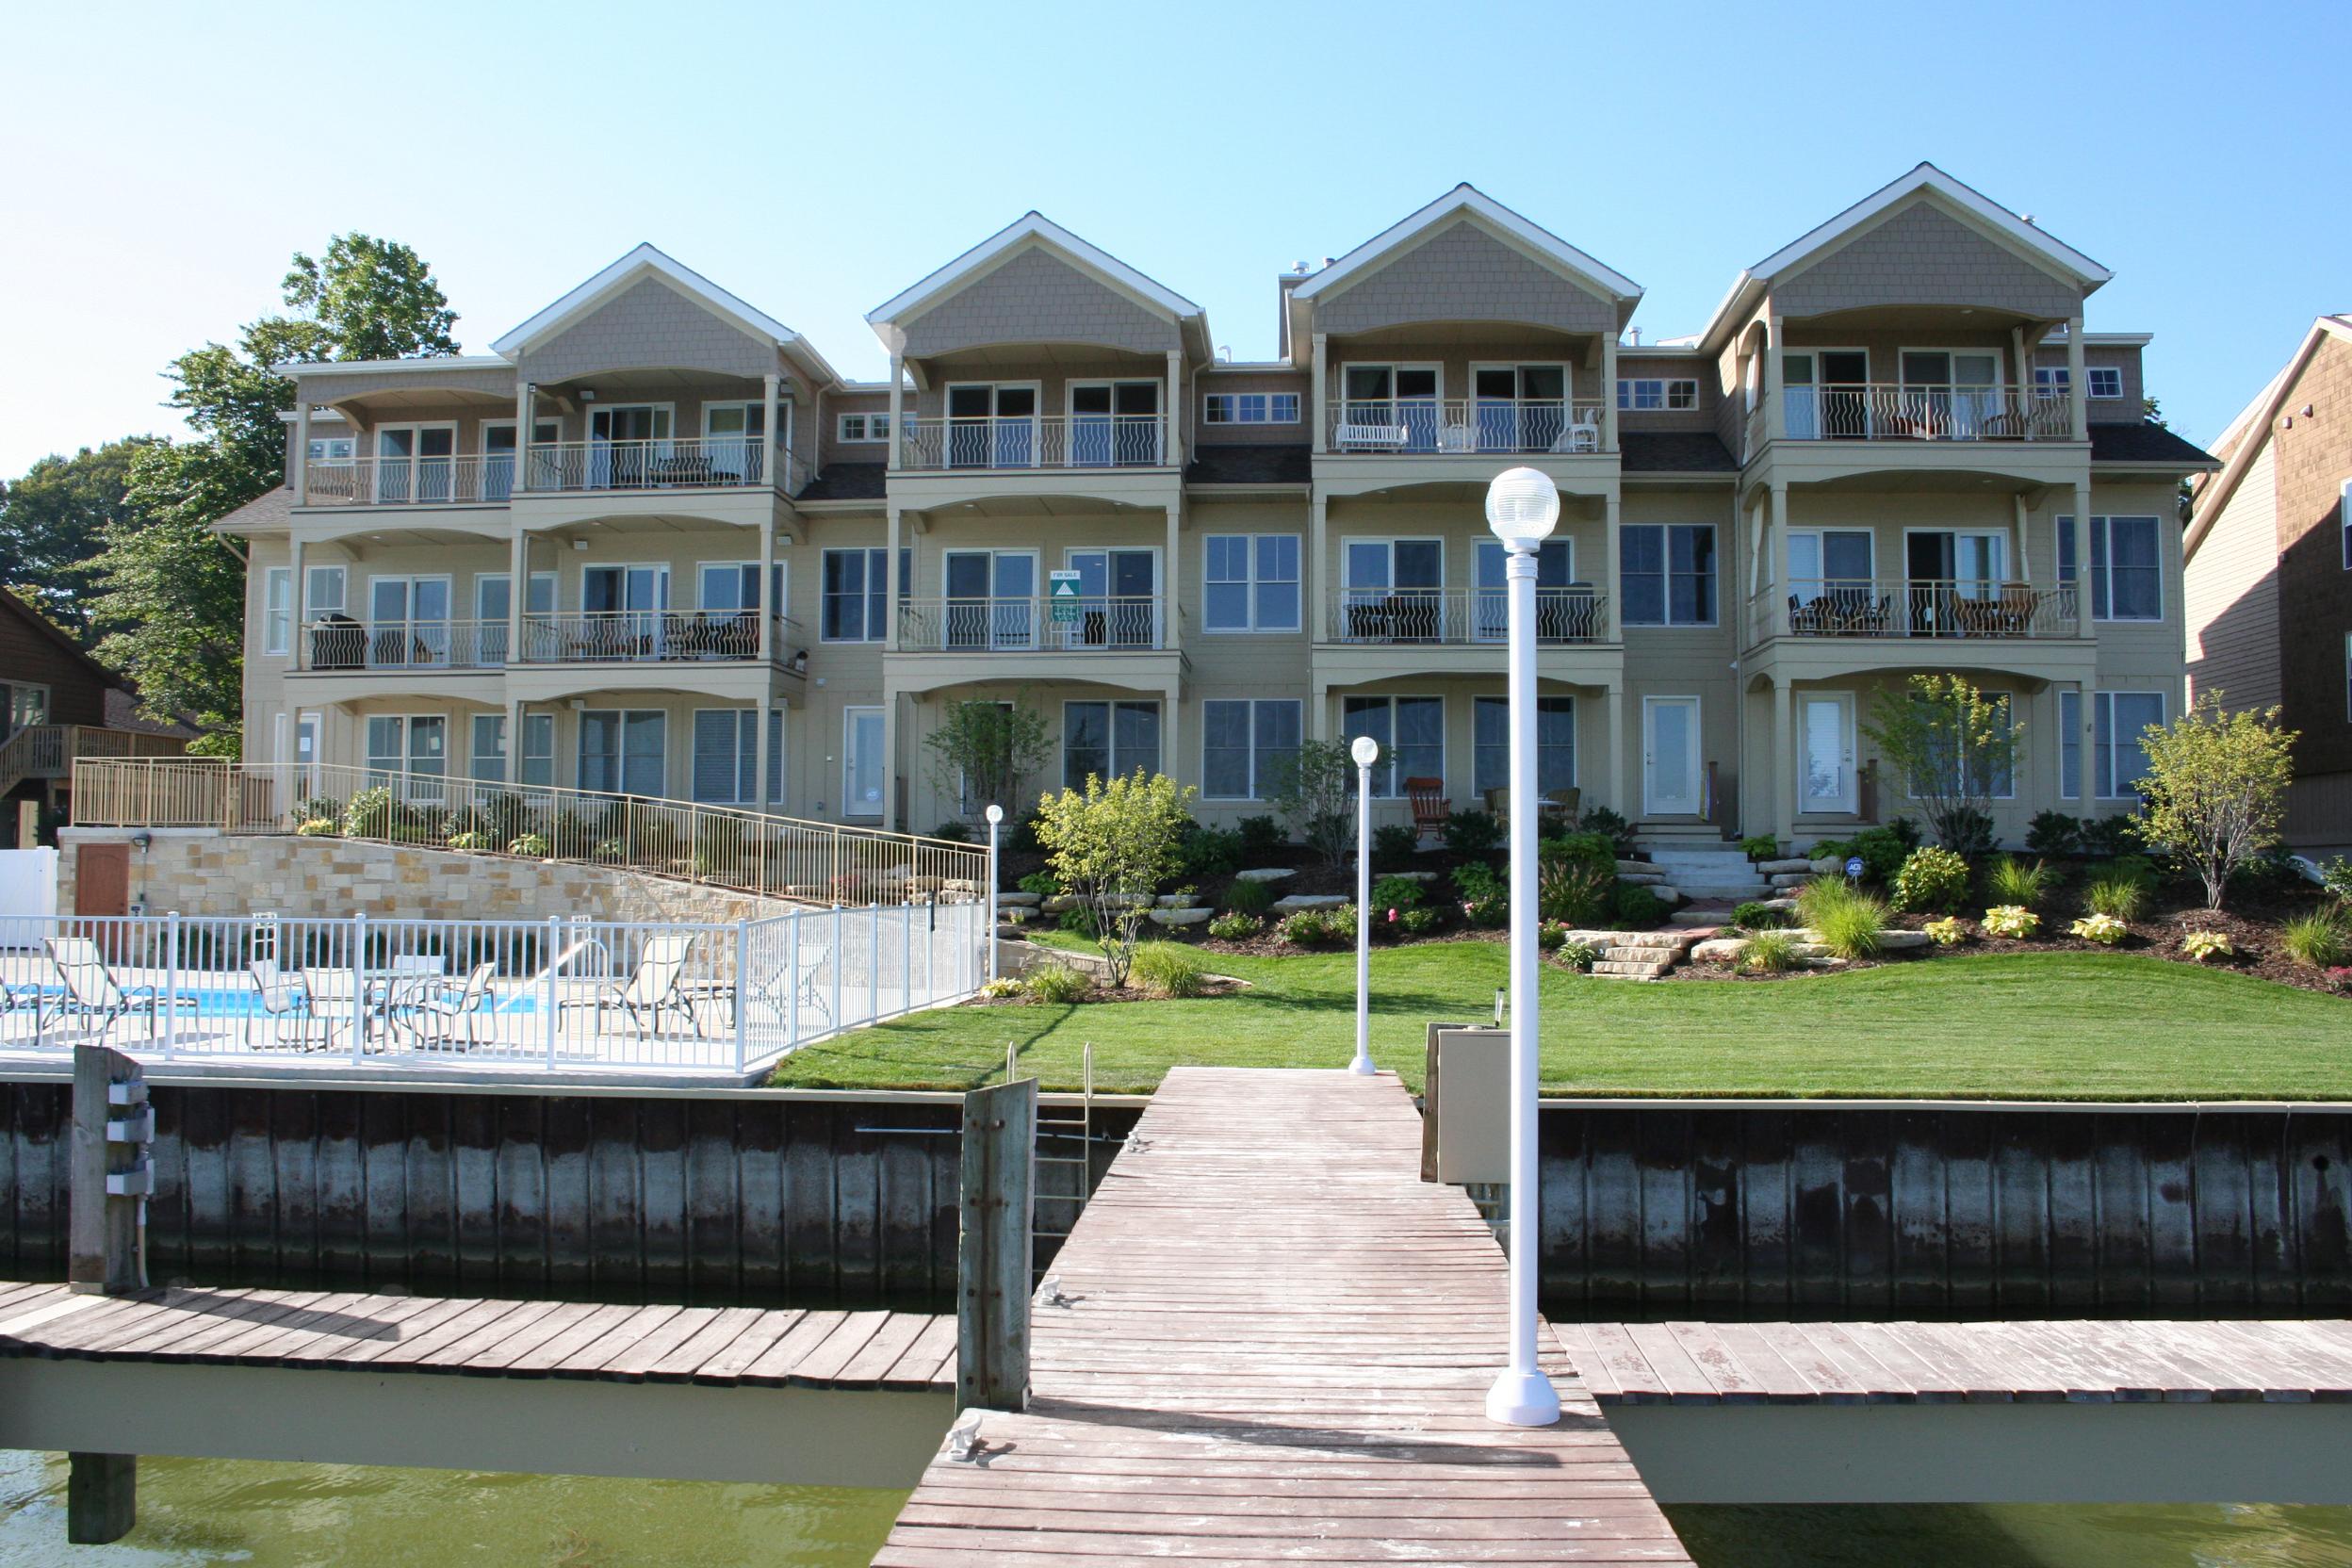 Condominium for Sale at Spacious and inviting waterfront condominium 1647-5 South Shore Drive Holland, Michigan 49423 United States